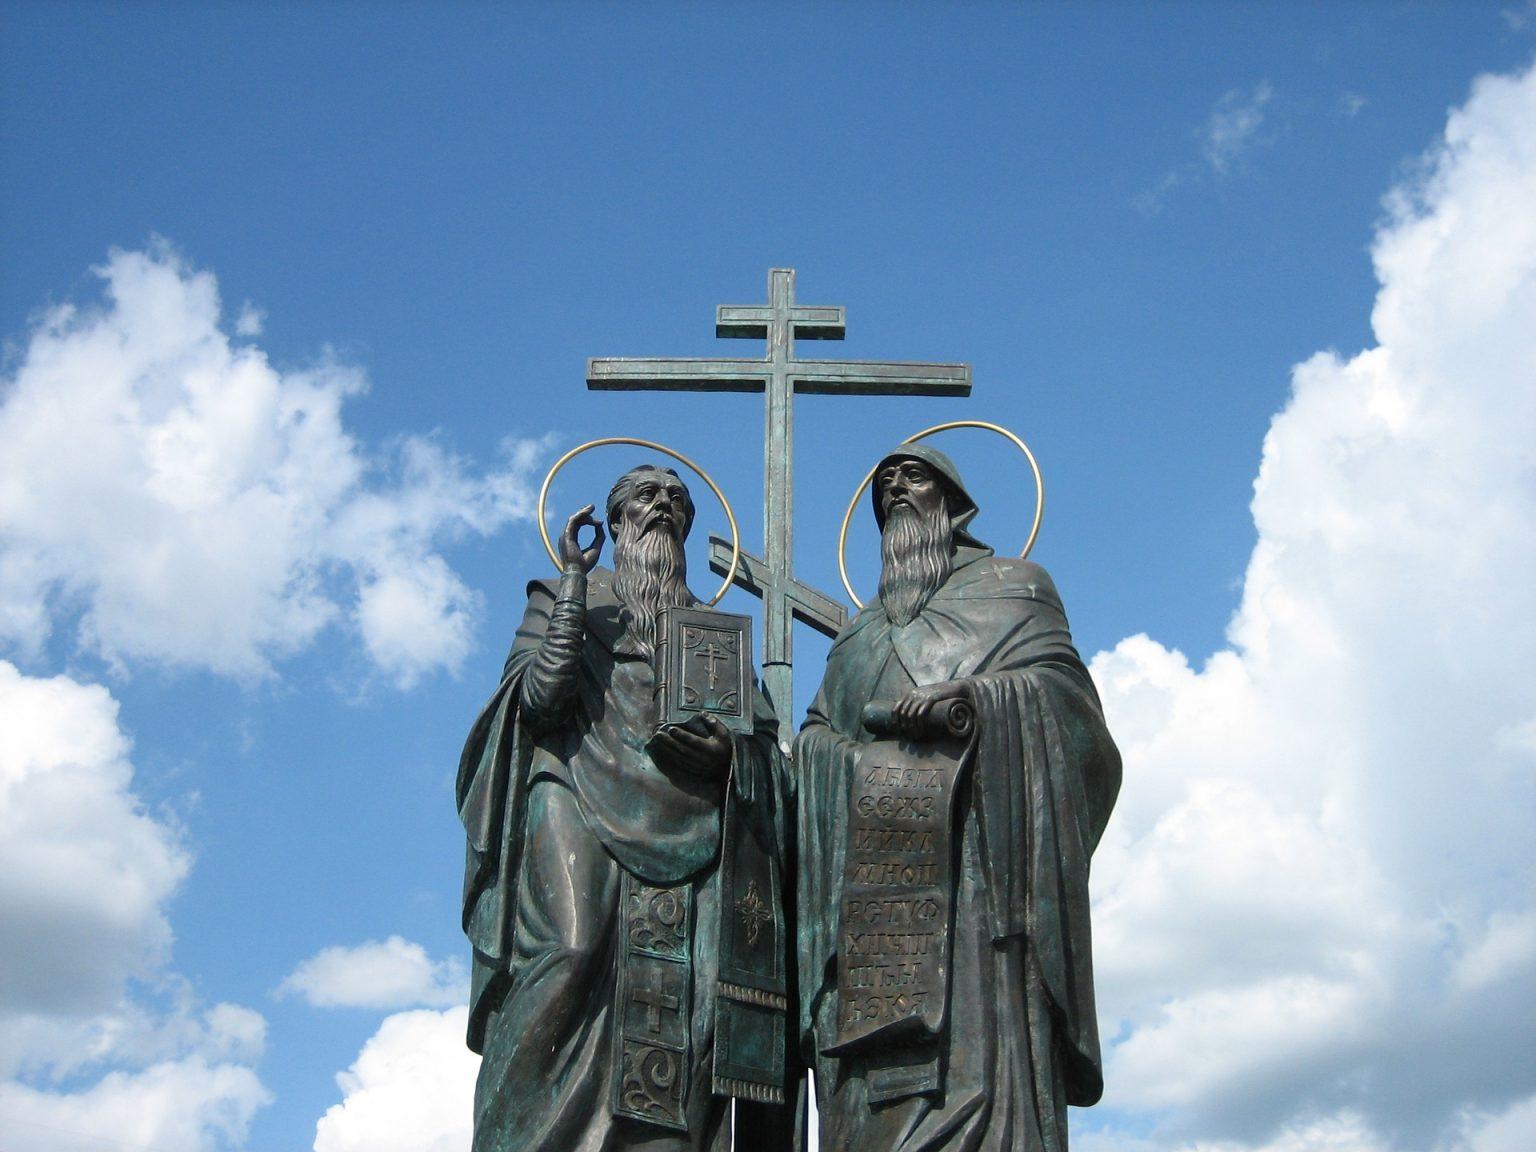 http://nrat.ukrintei.ua/wp-content/uploads/2020/04/statue-2171097_1920-1536x1152.jpg